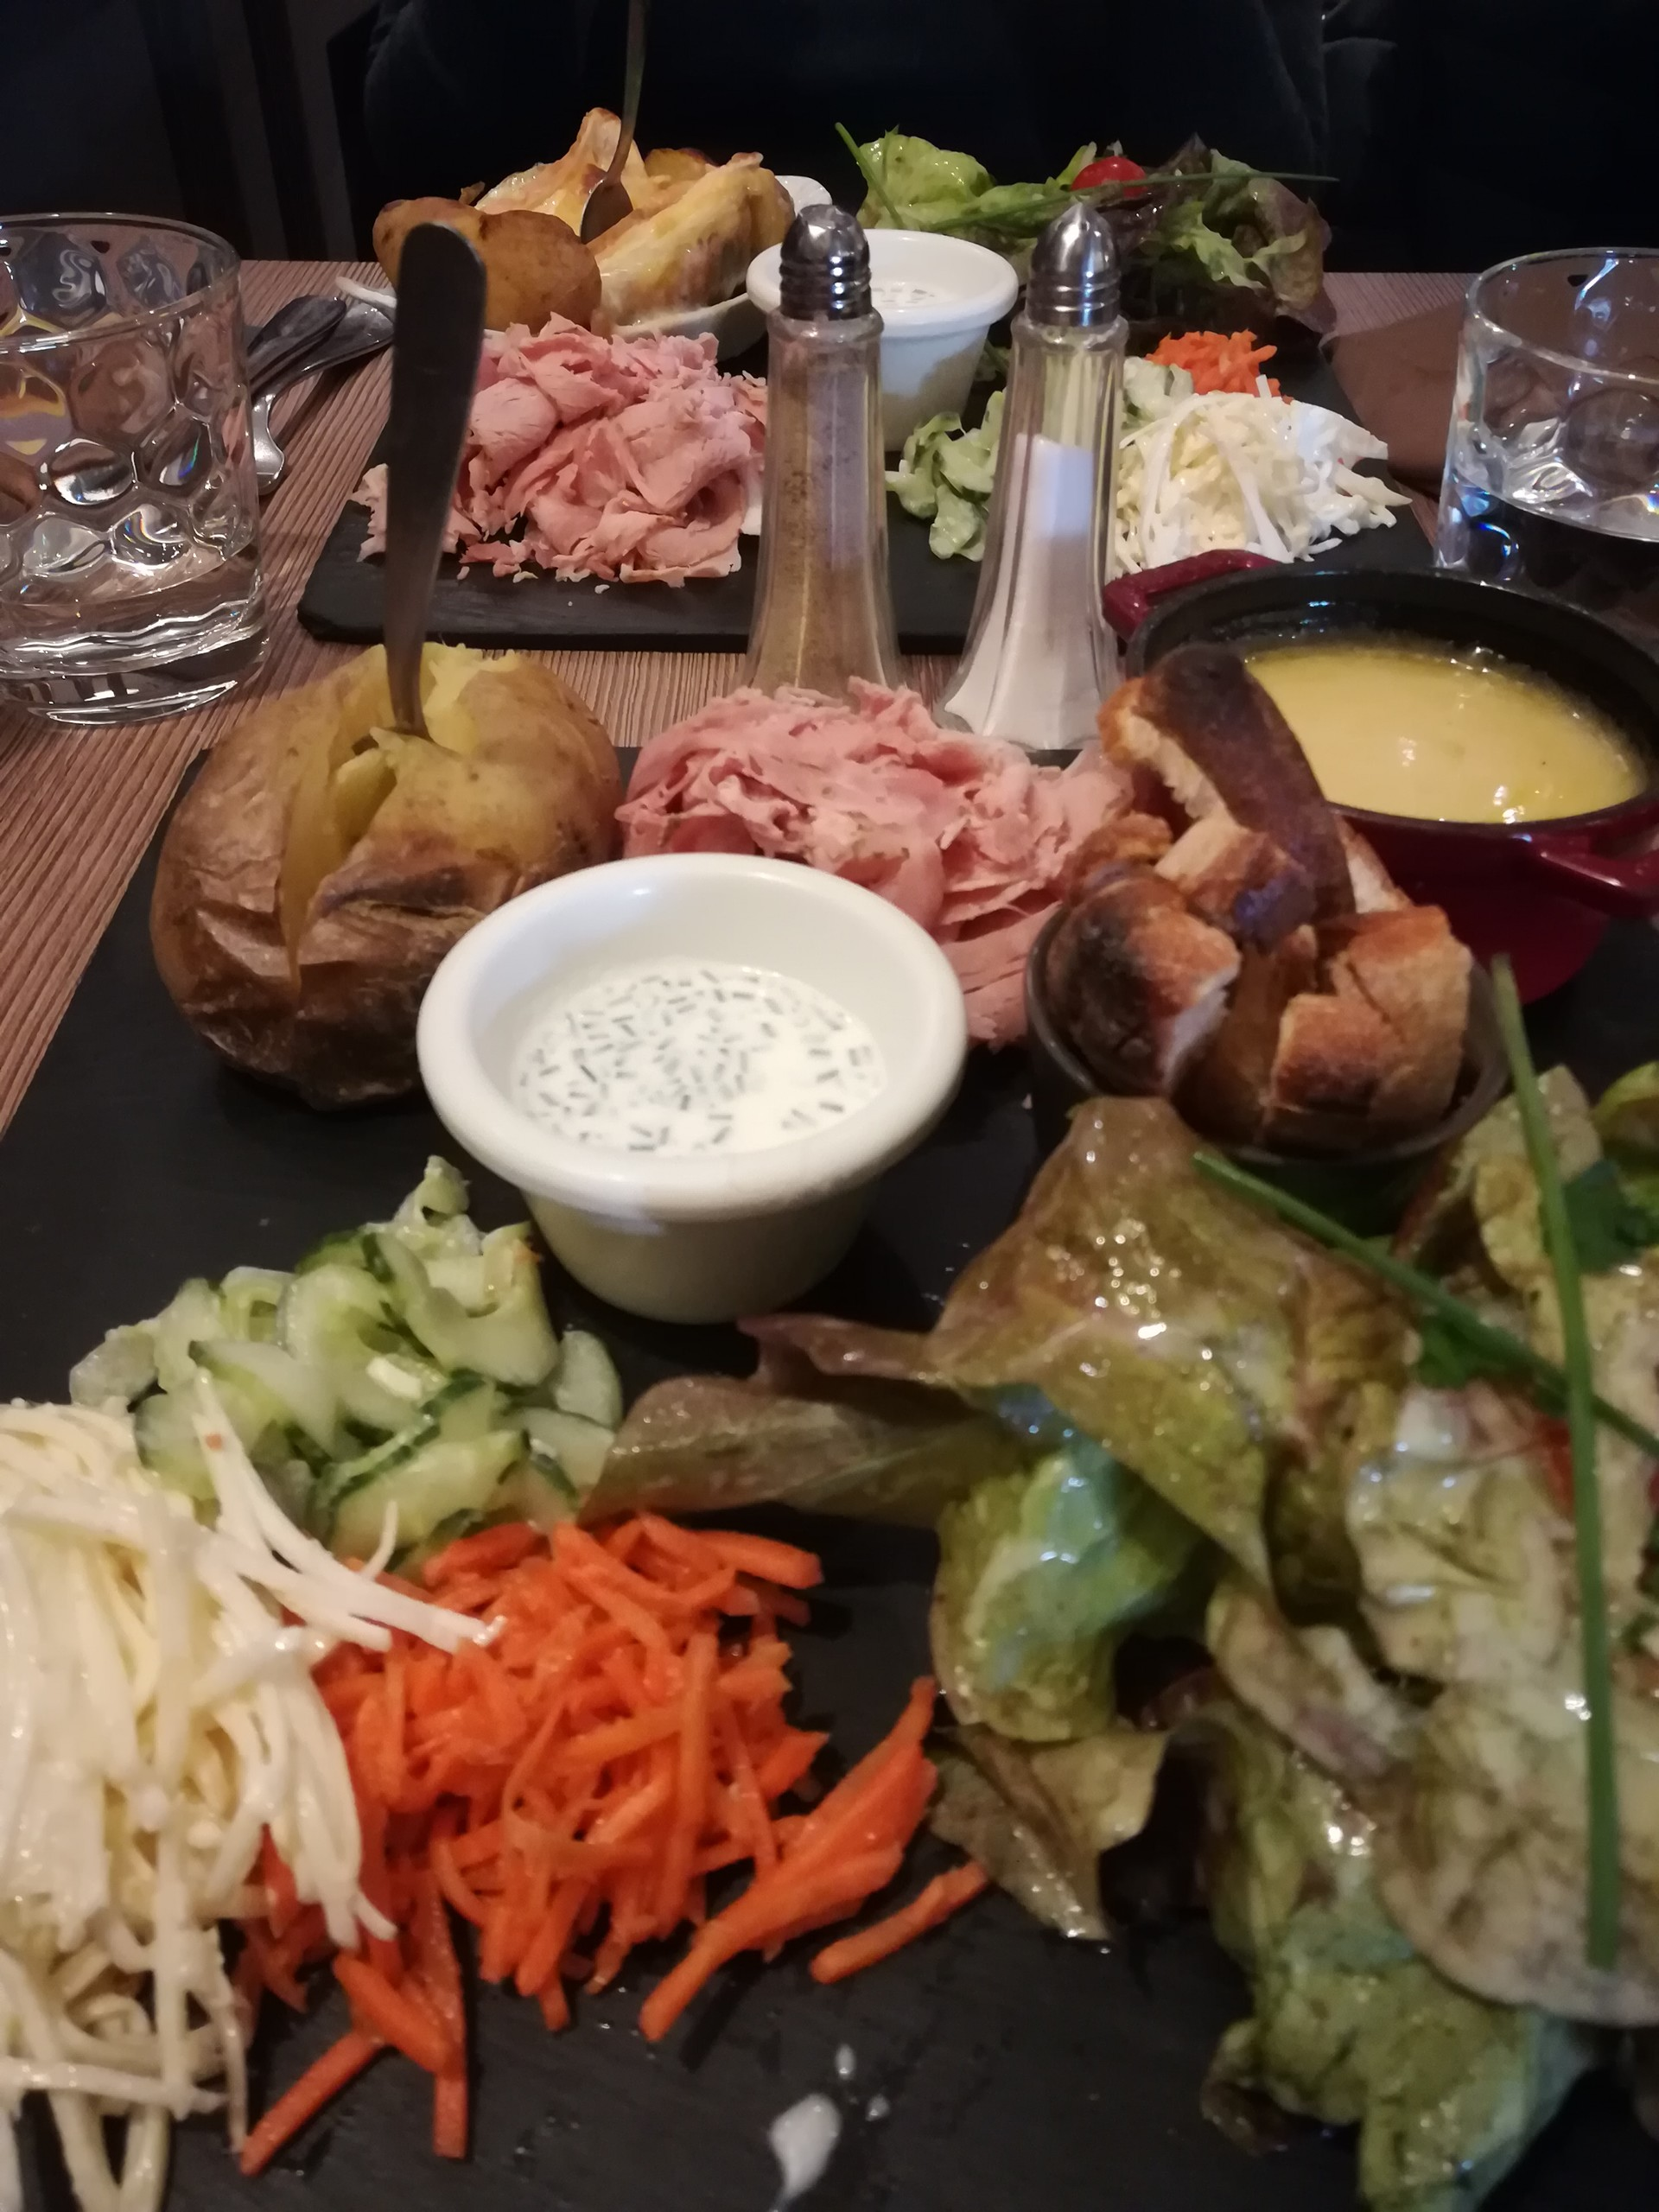 3-visite-a-metz-les-restaurants-d95542c6